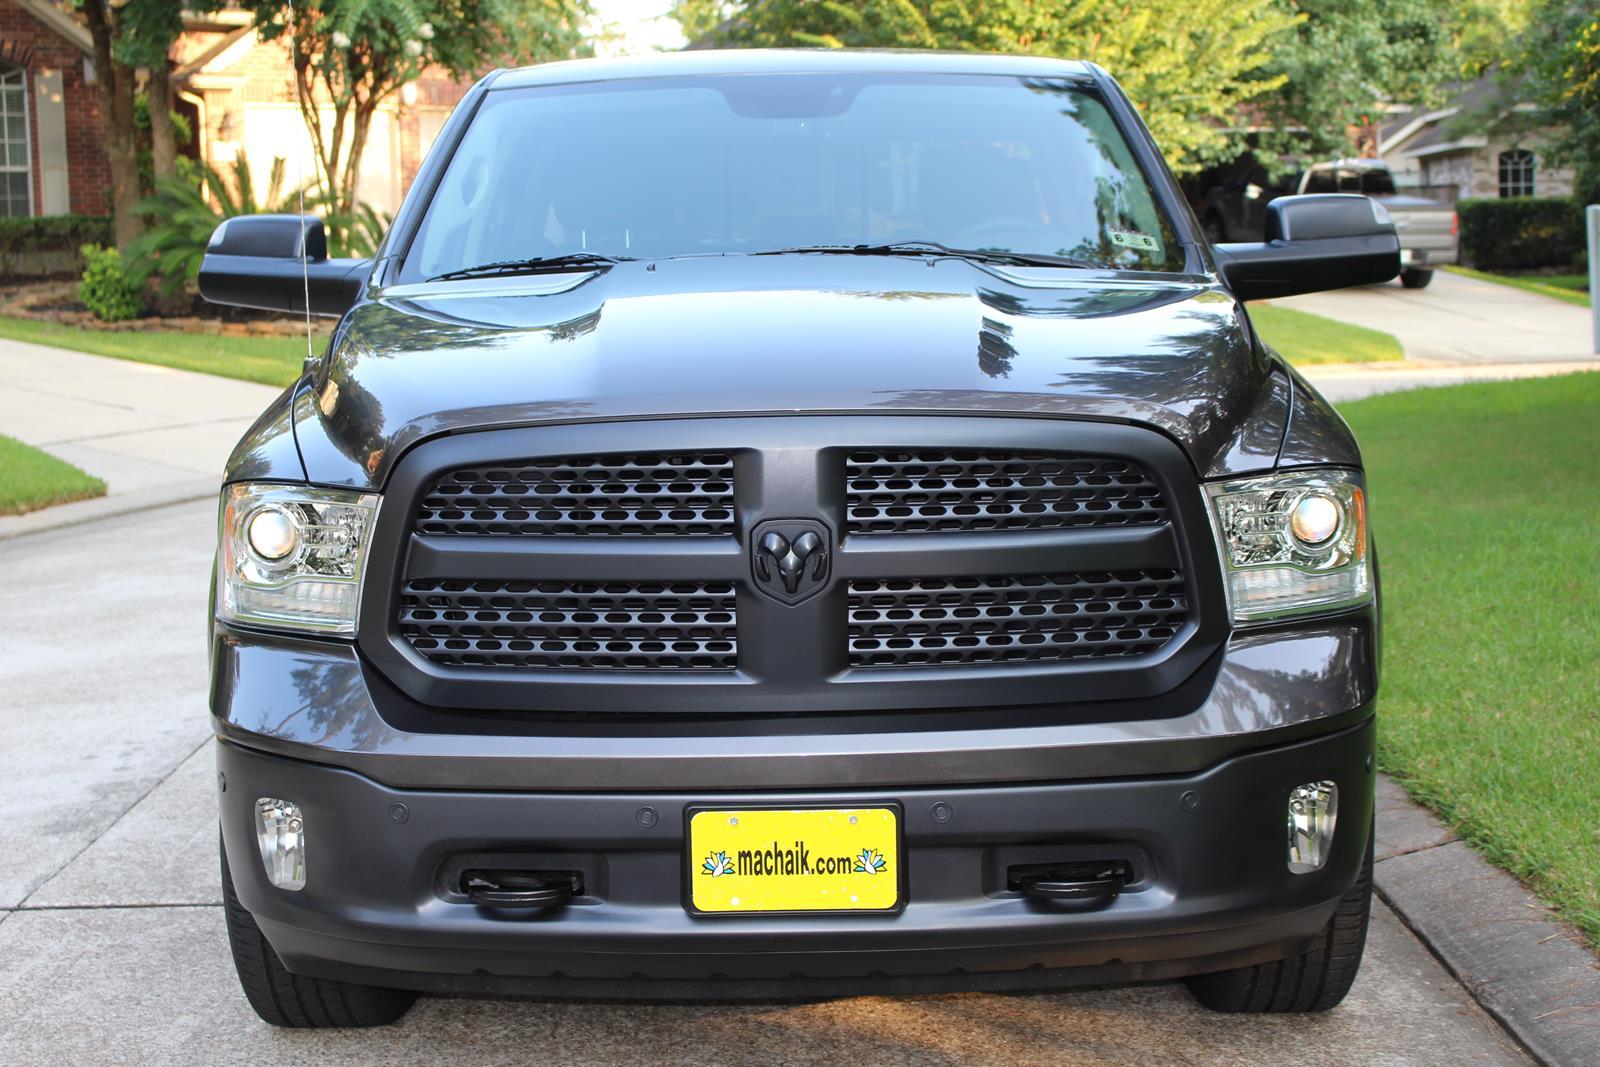 2014 Dodge Ram 2500 Led Tail Lights